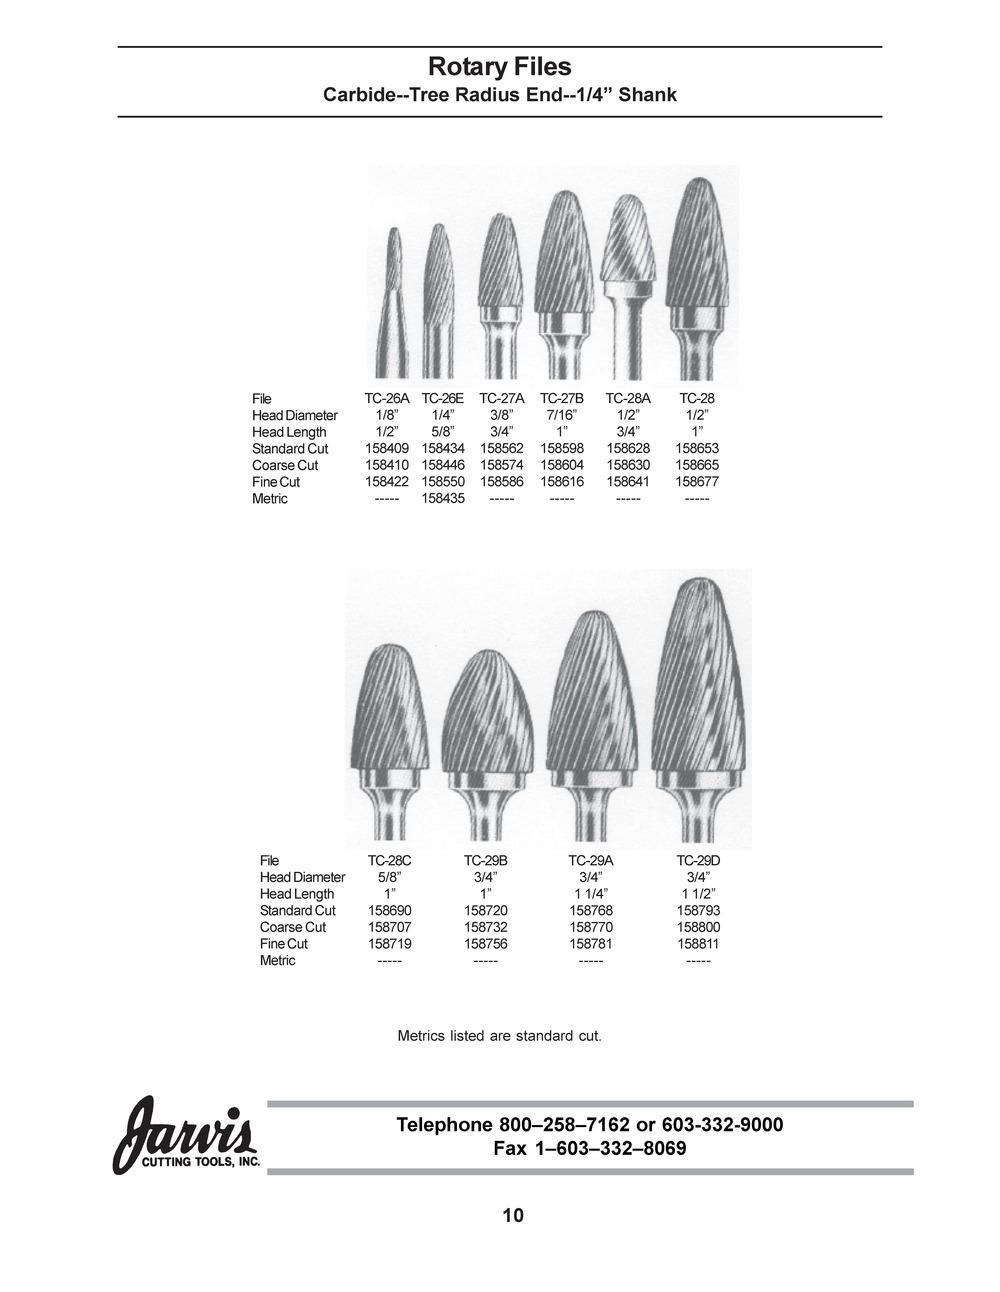 Rotary-Files-Catalog_Page_10.jpg